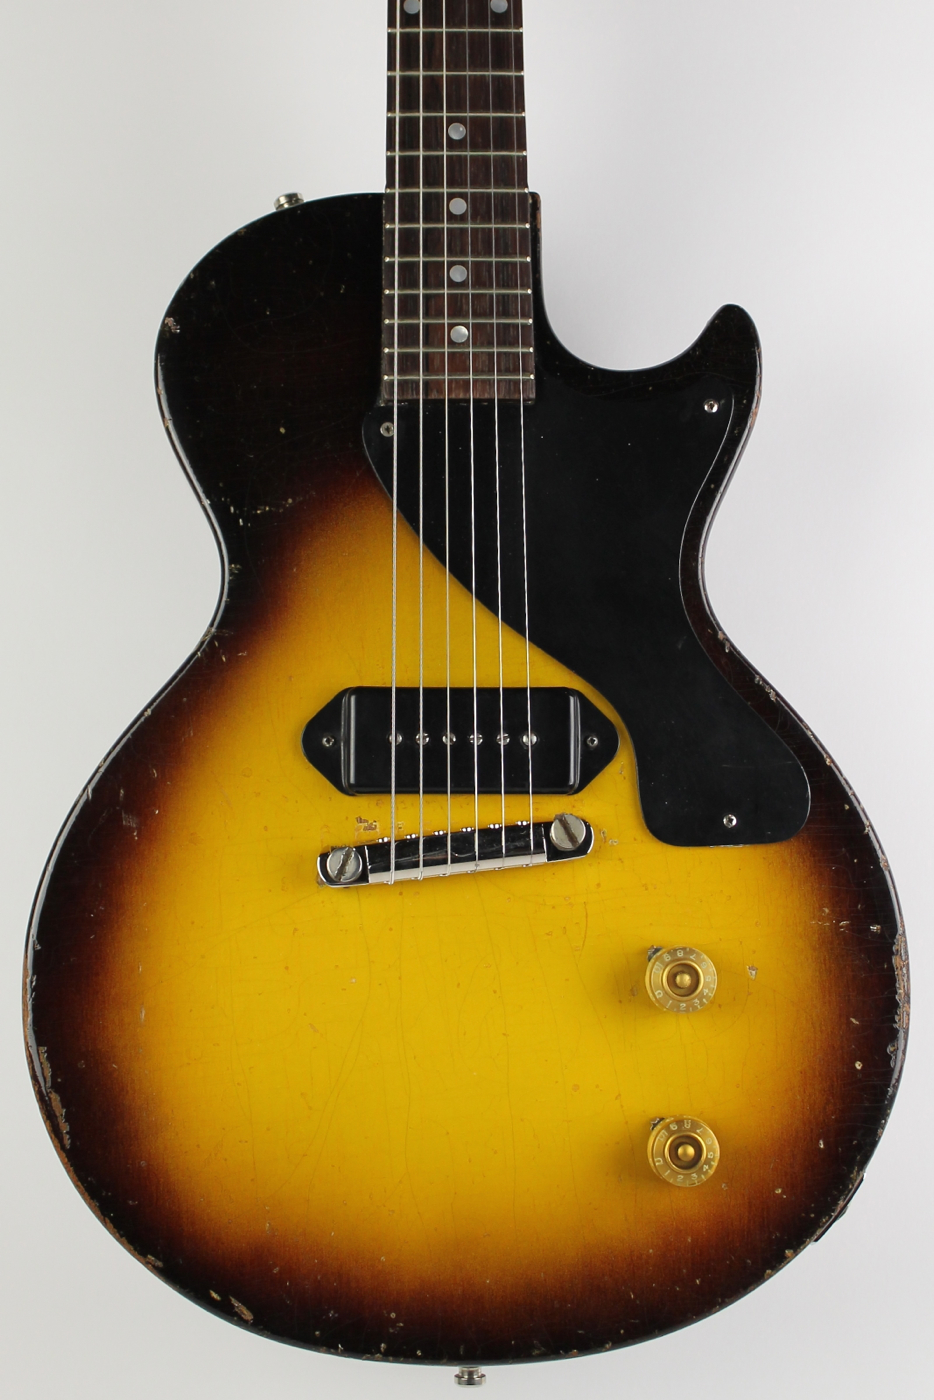 gibson les paul junior 1957 sunburst guitar for sale thunder road guitars. Black Bedroom Furniture Sets. Home Design Ideas